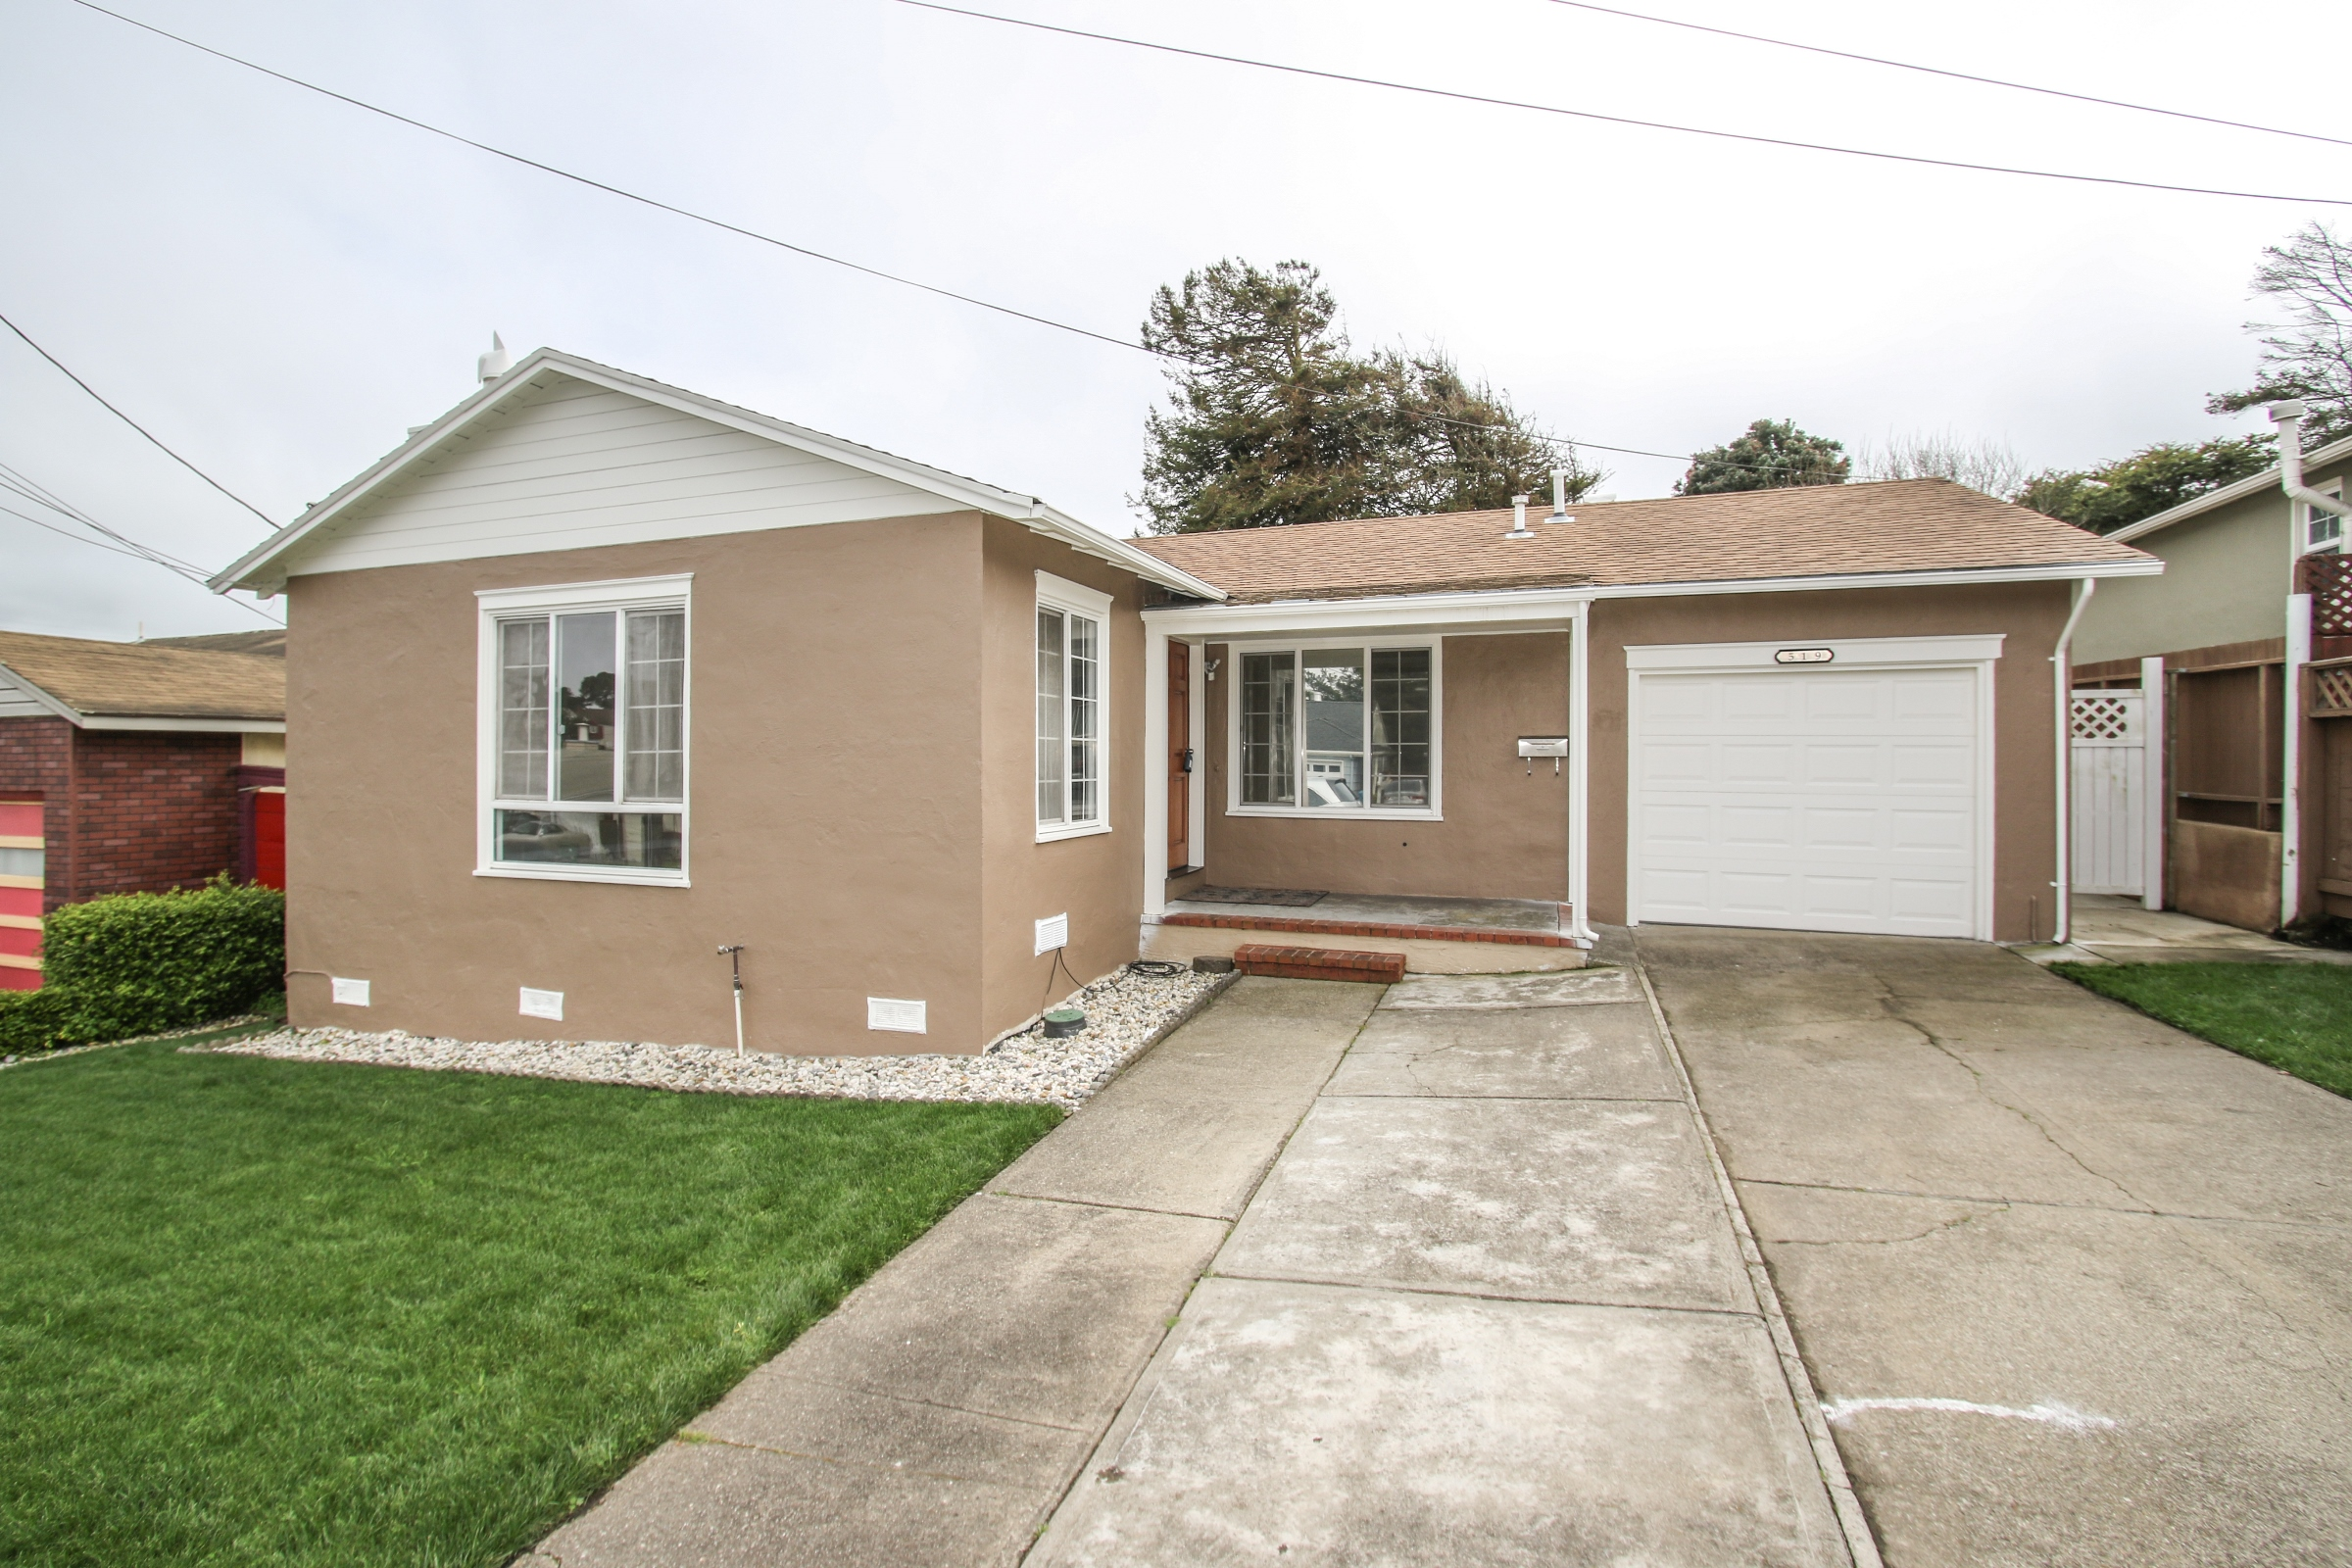 519 87th St, Daly City, CA 94015